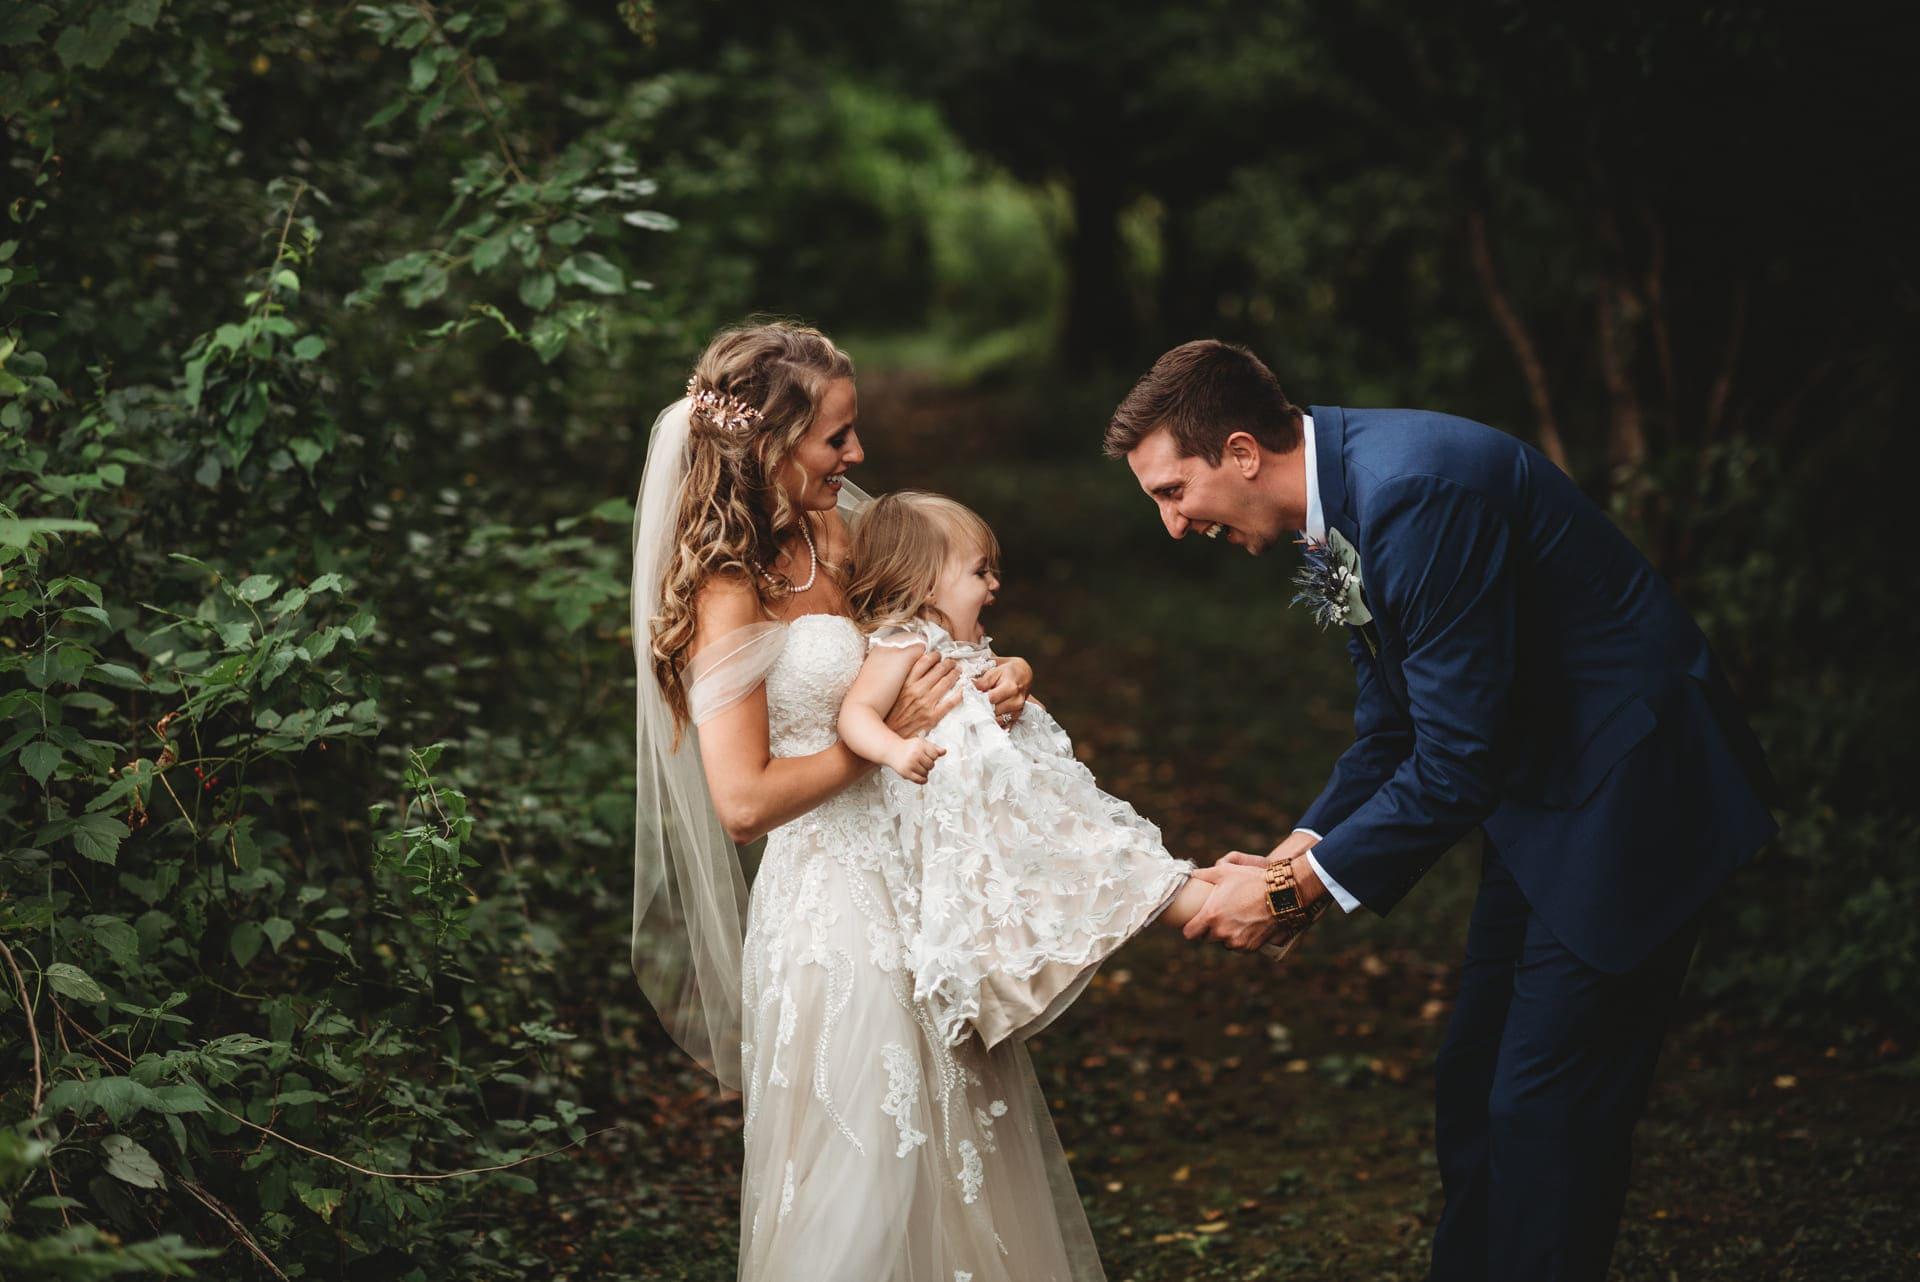 Girl Brides Richland Michigan Wedding Photography